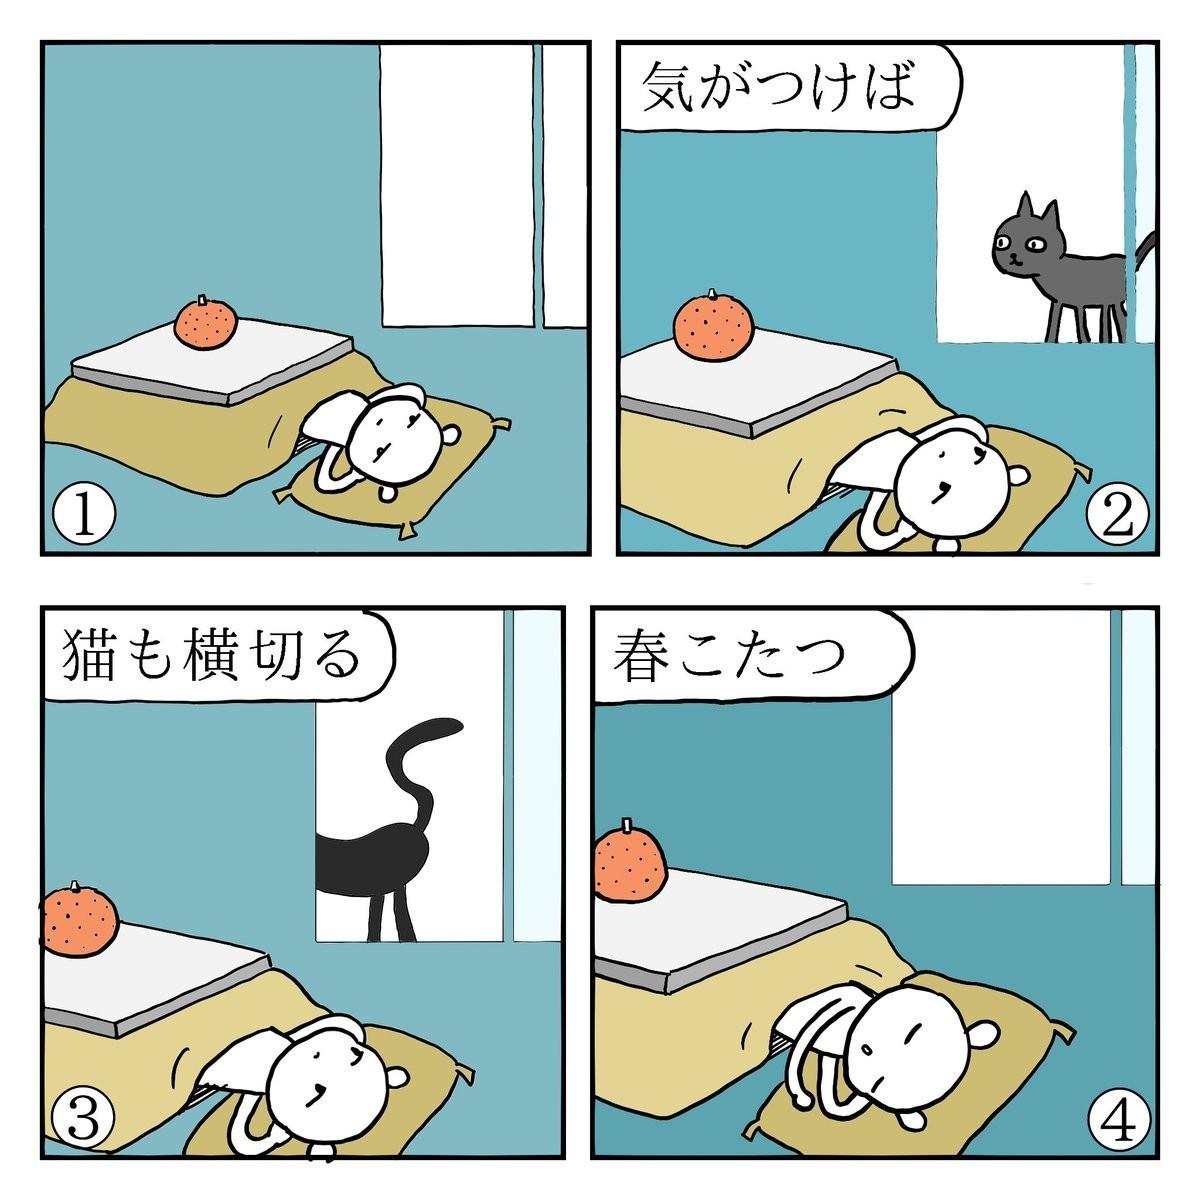 f:id:kanarihikokuma:20190320091732j:image:w330